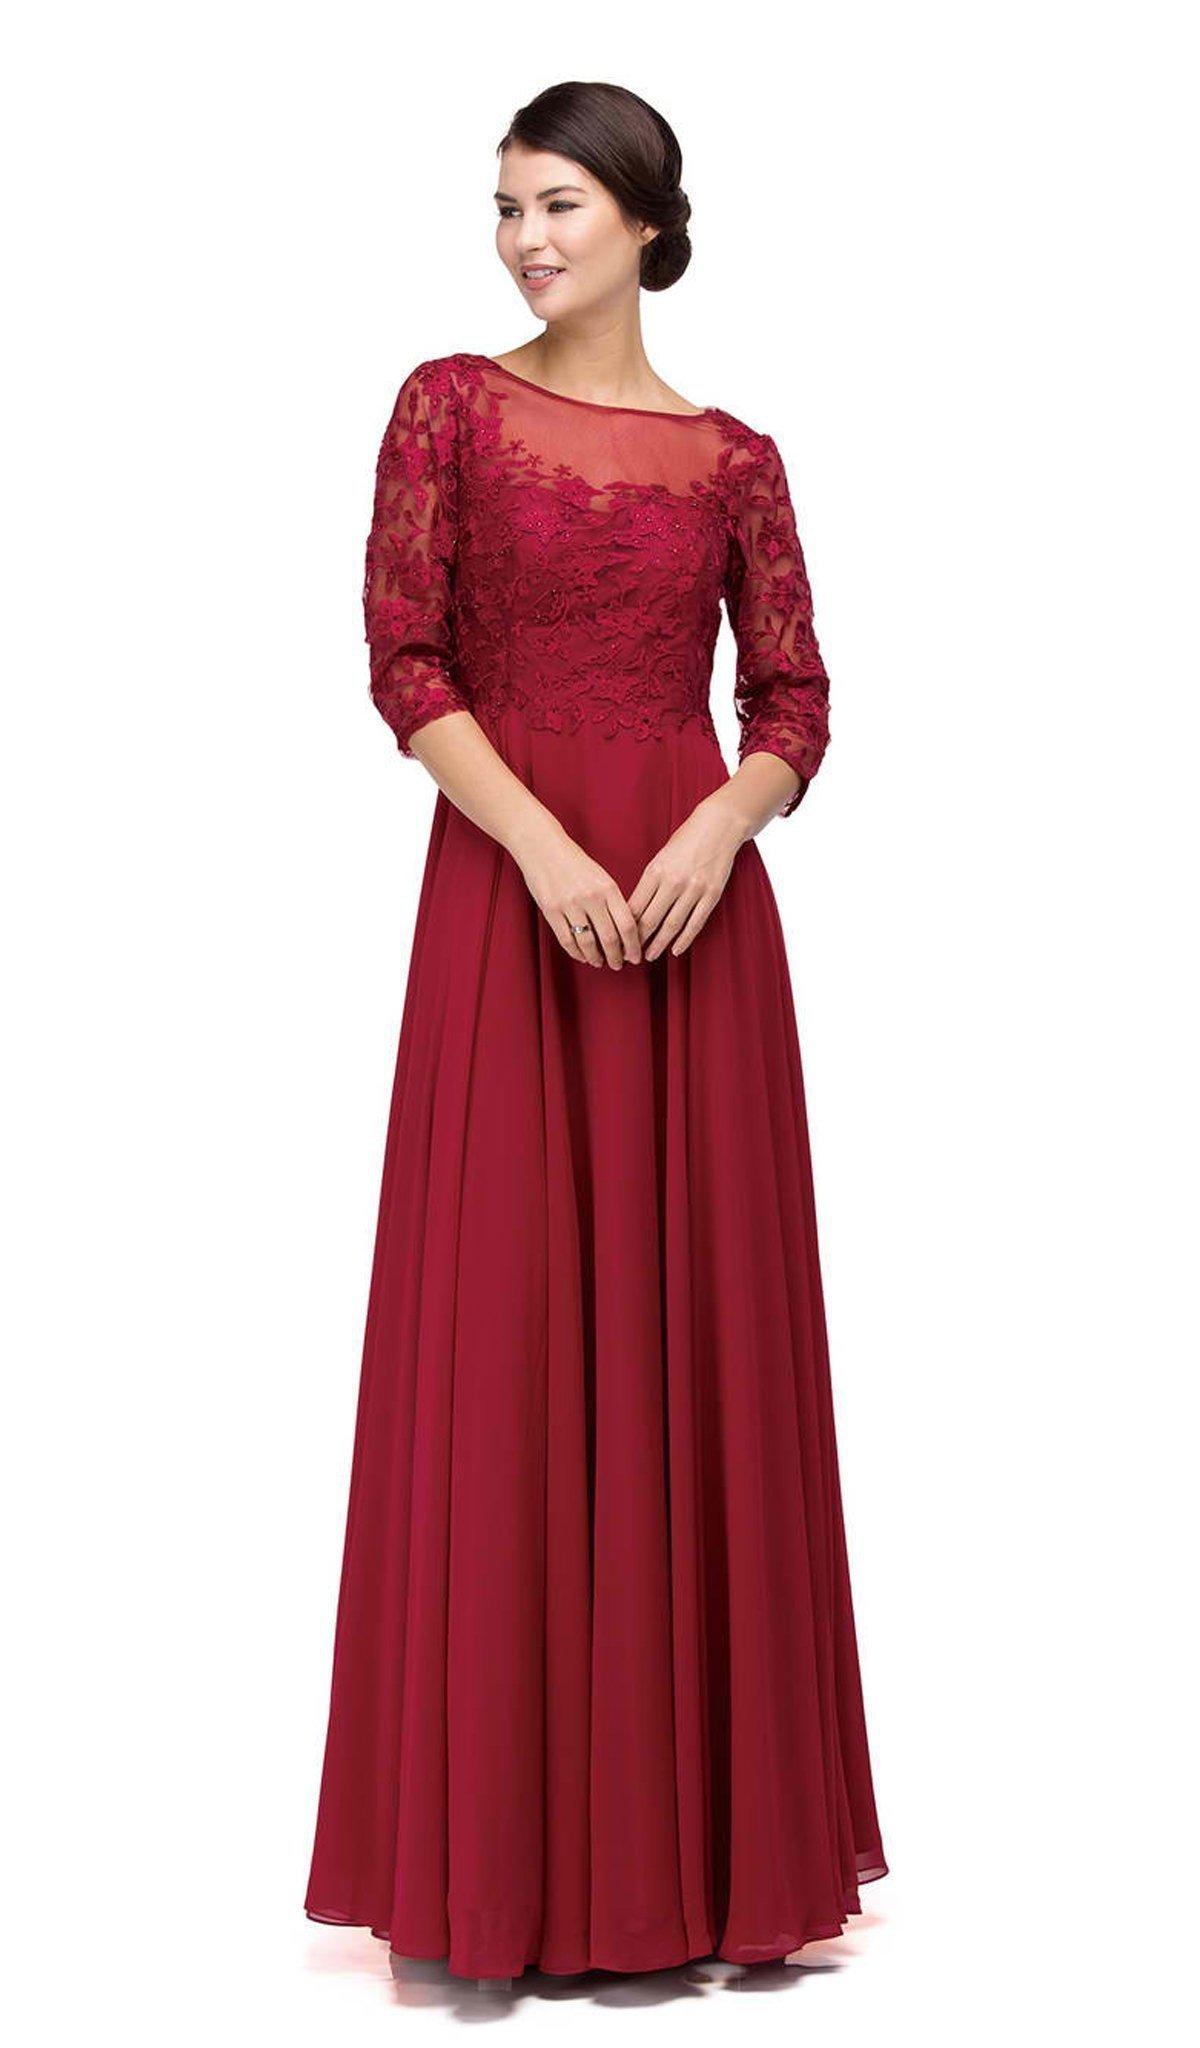 Dancing Queen - 9559 Gorgeous 3/4 Sleeve Sheer Long Prom Dress